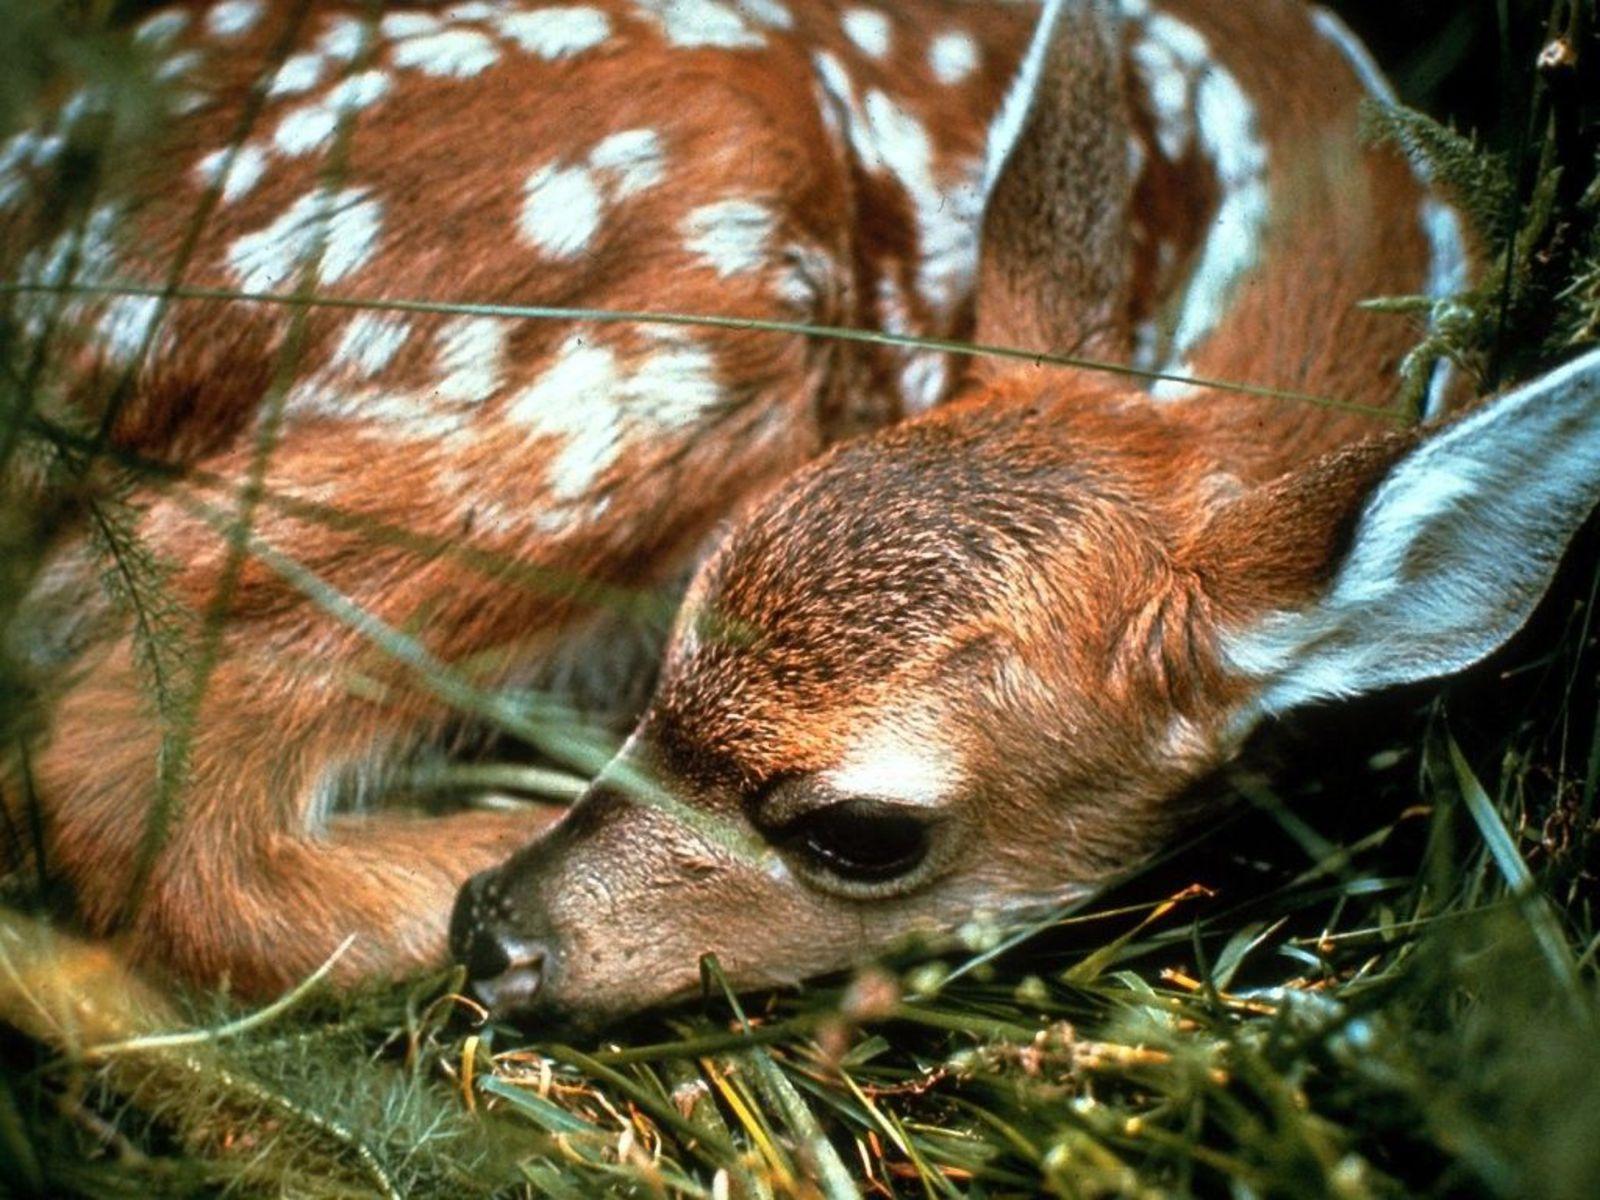 http://2.bp.blogspot.com/_EAViqbzwc_s/TN_RpVhbuAI/AAAAAAAACC4/kACwZH9bW3Y/s1600/Deer_01.jpg